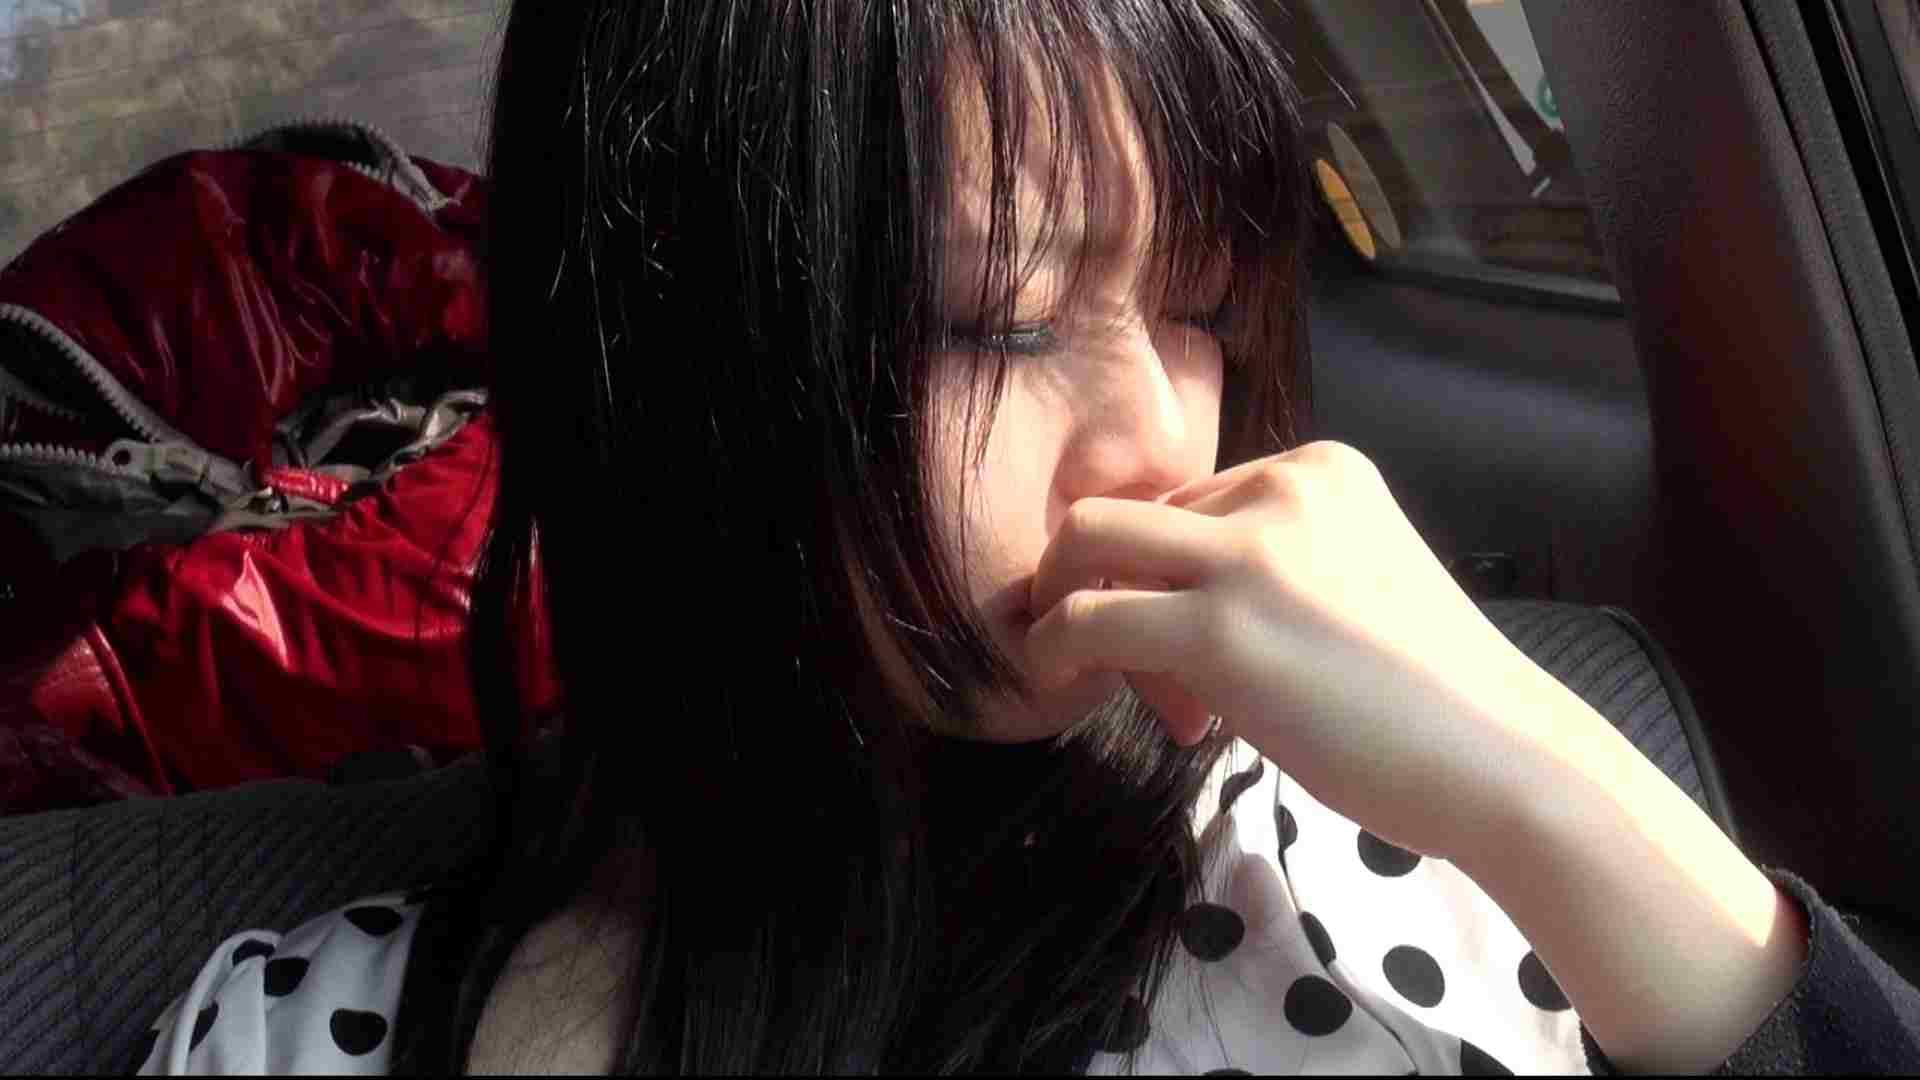 vol.4 鬼神さん様子見で車内ローター攻め 車 おめこ無修正動画無料 65pic 11